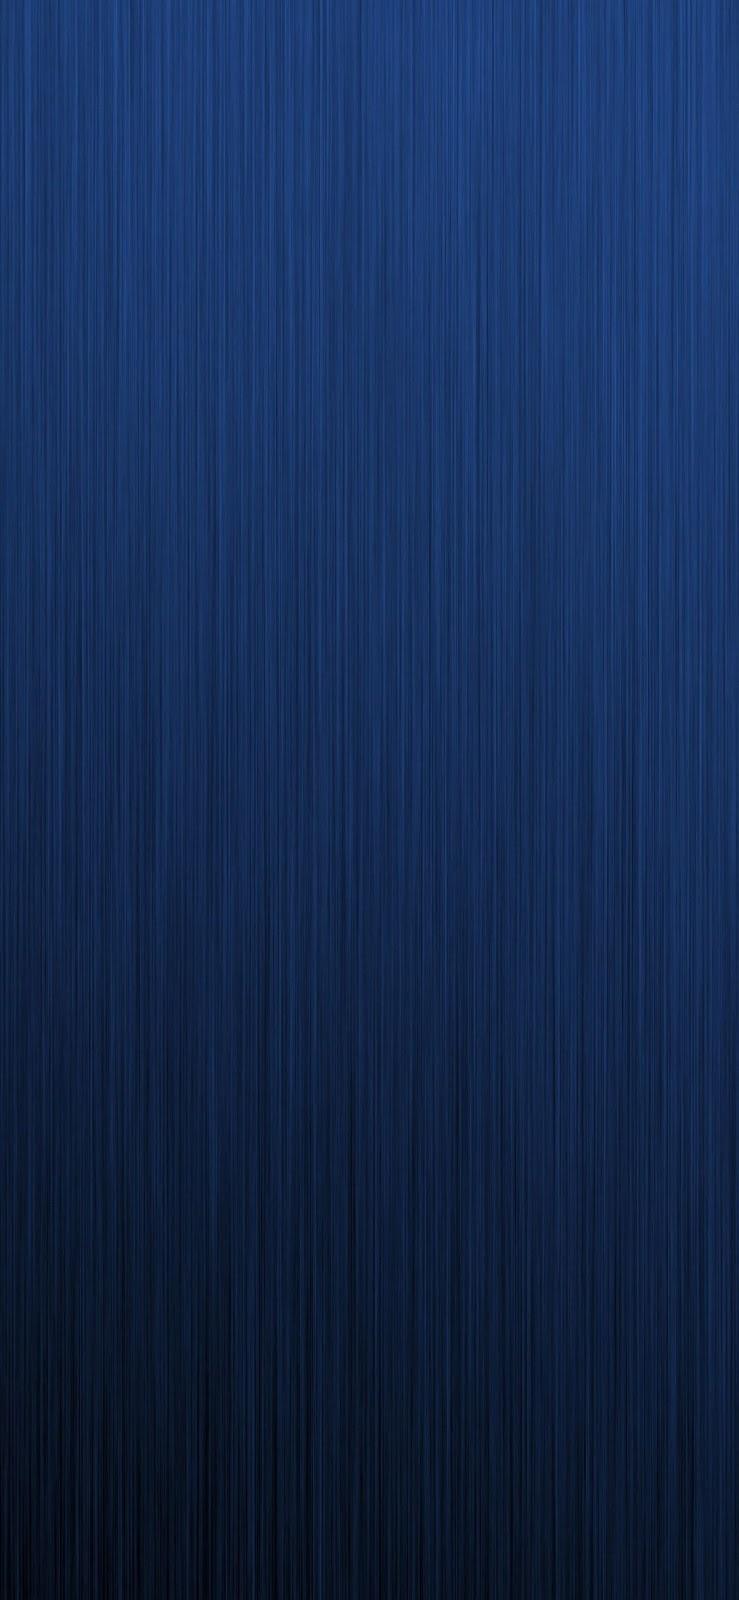 Wallpaper iPhone X 4K